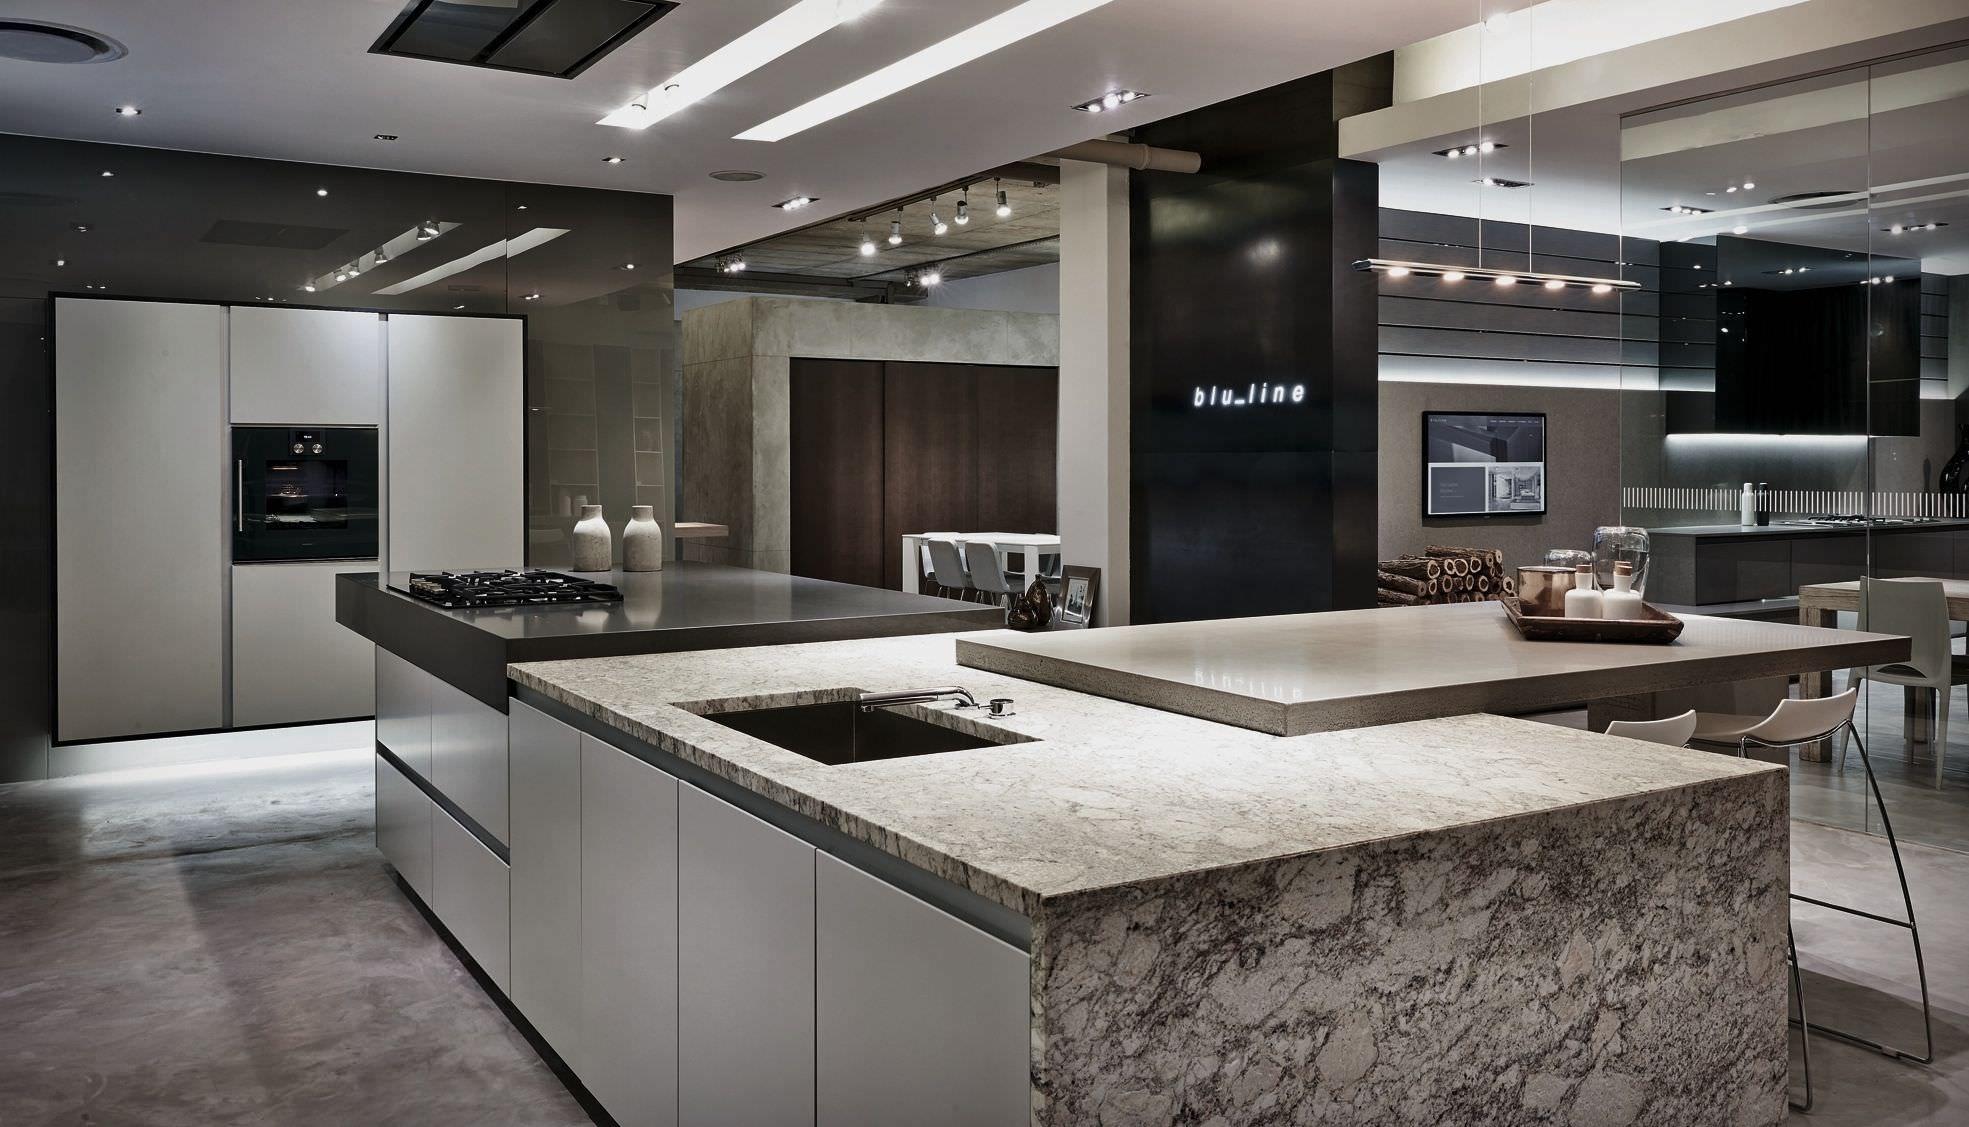 showroom | Showroom interior design, Beautiful kitchens ...